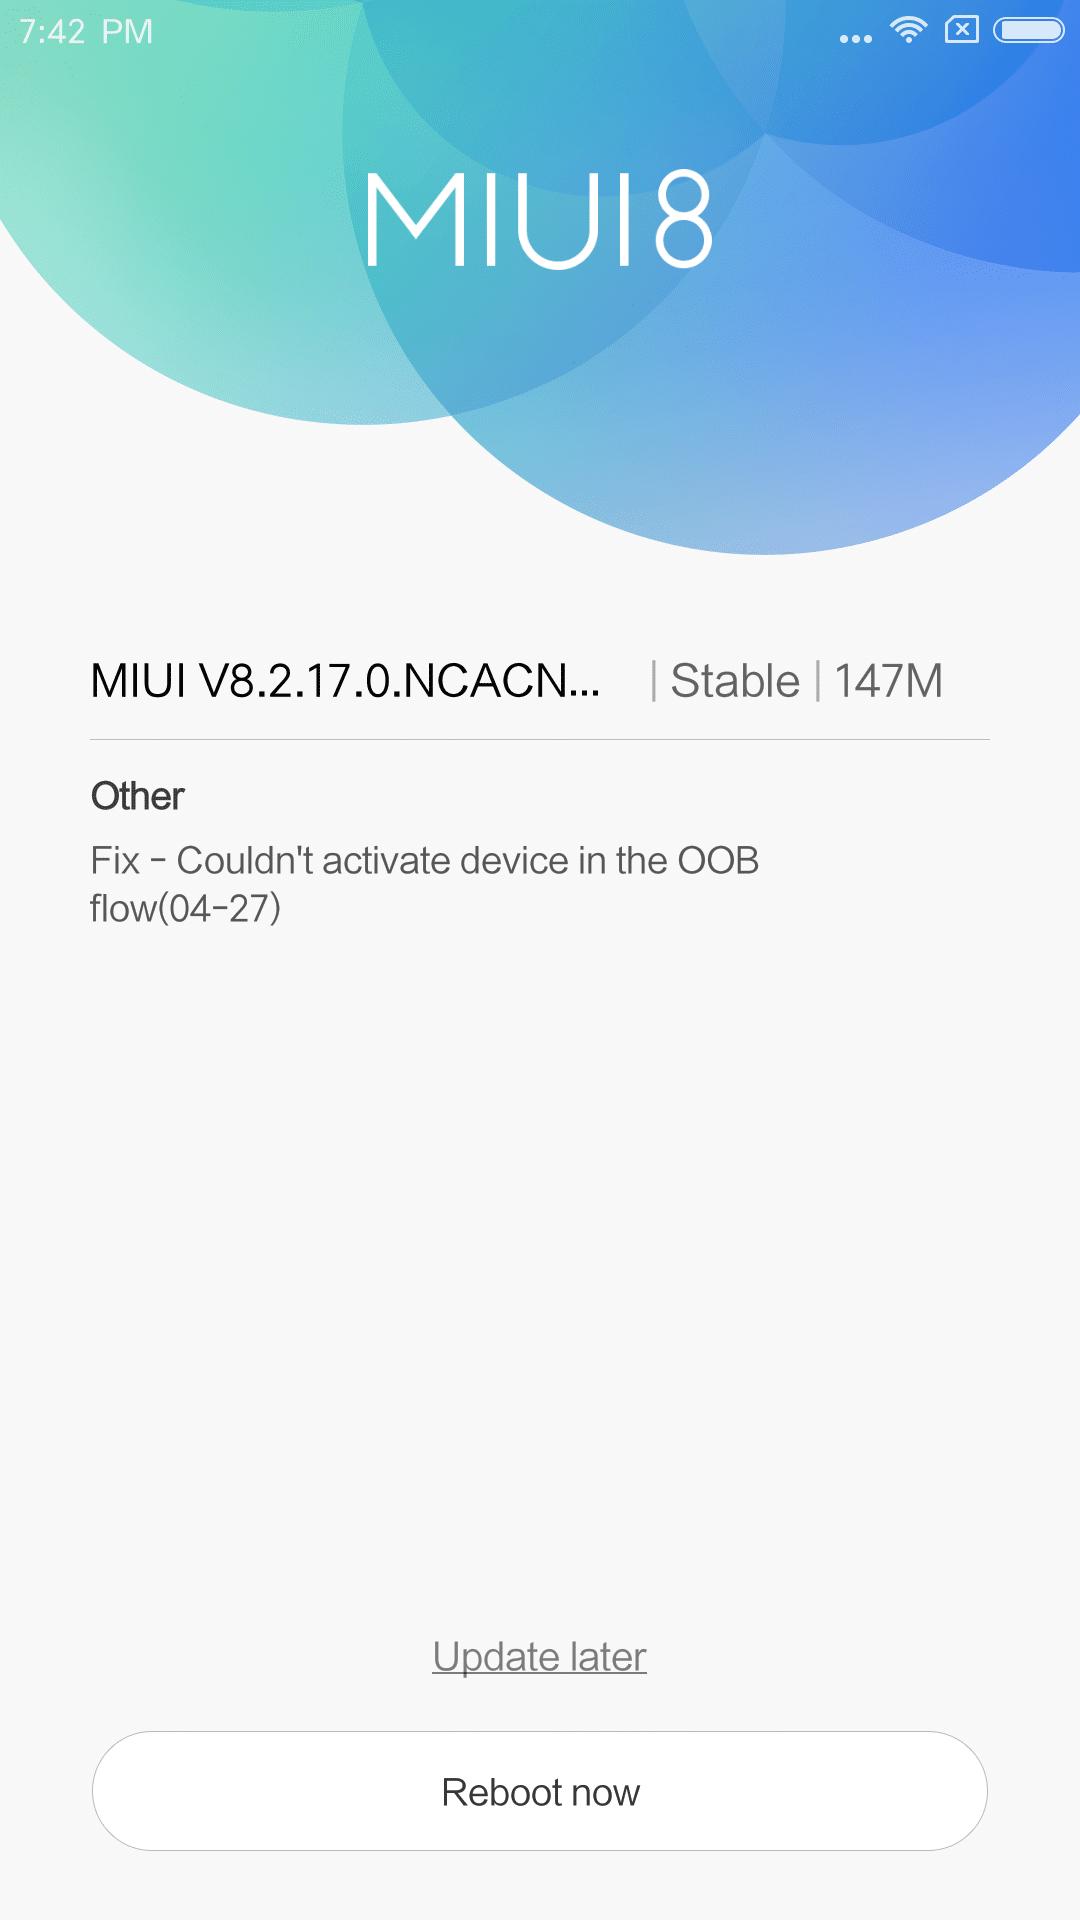 Screenshot_2017-05-10-19-42-49-142_com.android.updater